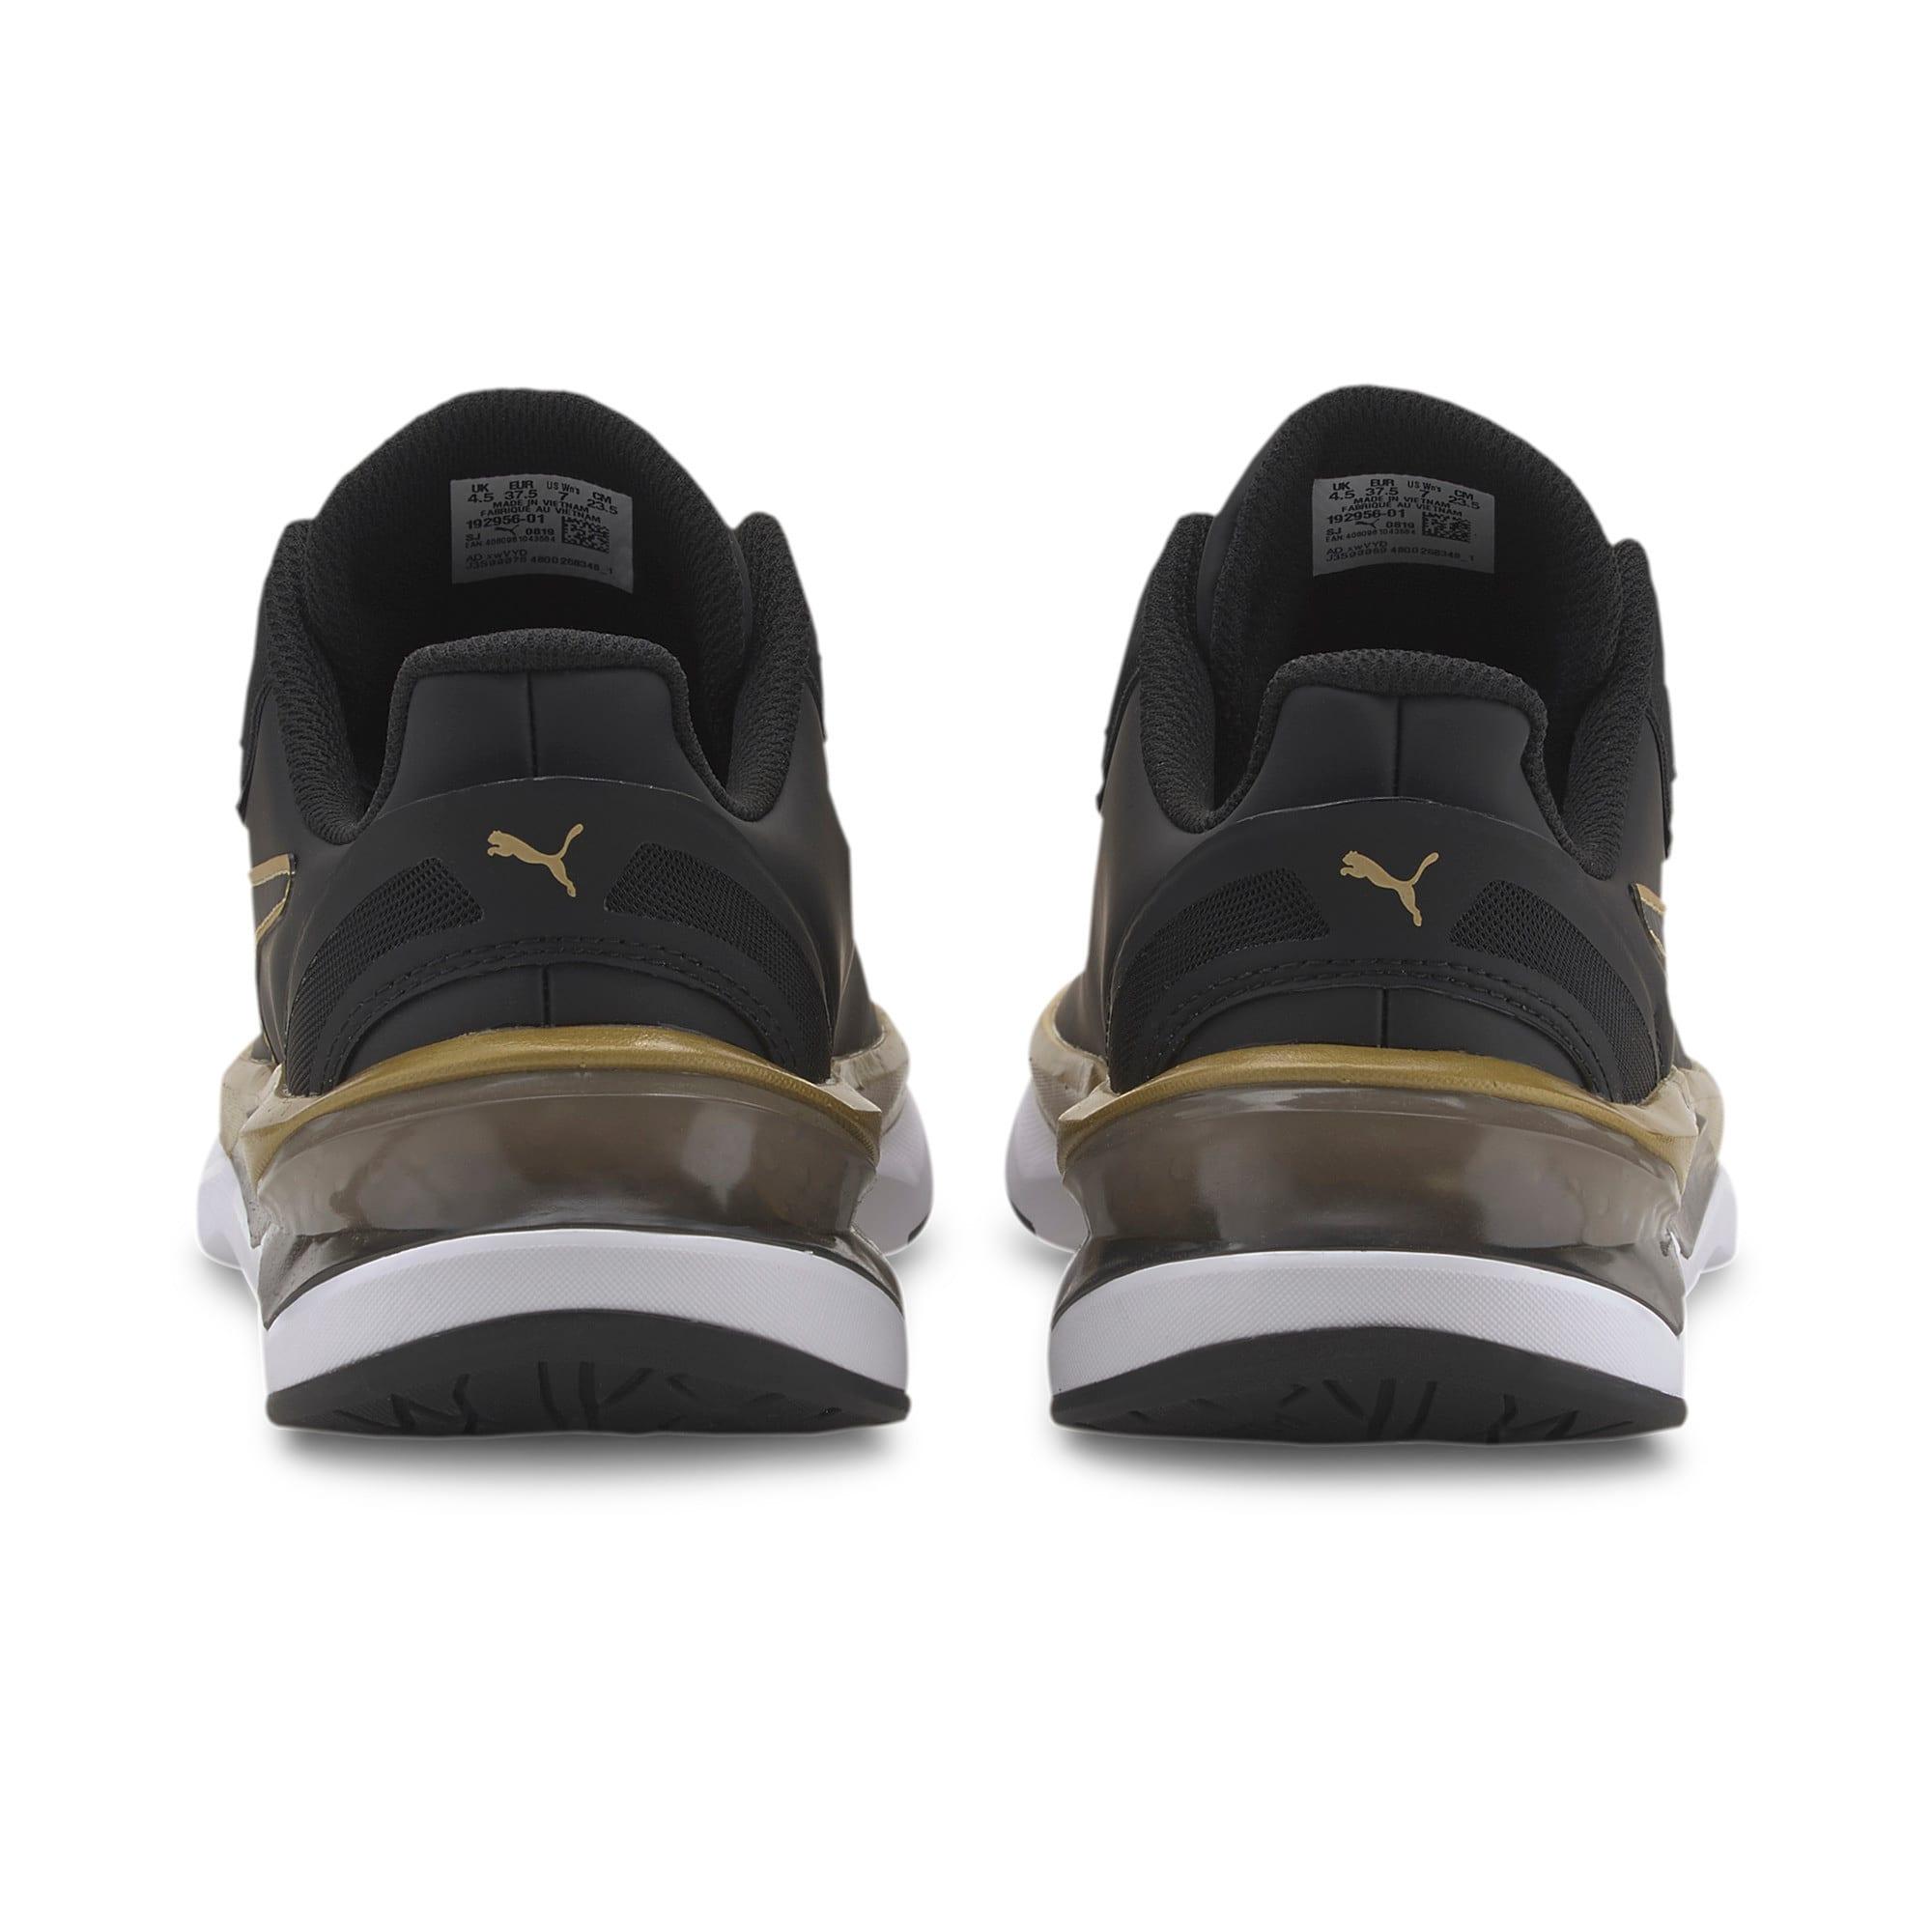 Thumbnail 3 of LQDCELL Shatter XT Matte Women's Training Shoes, Puma Black-Puma Team Gold, medium